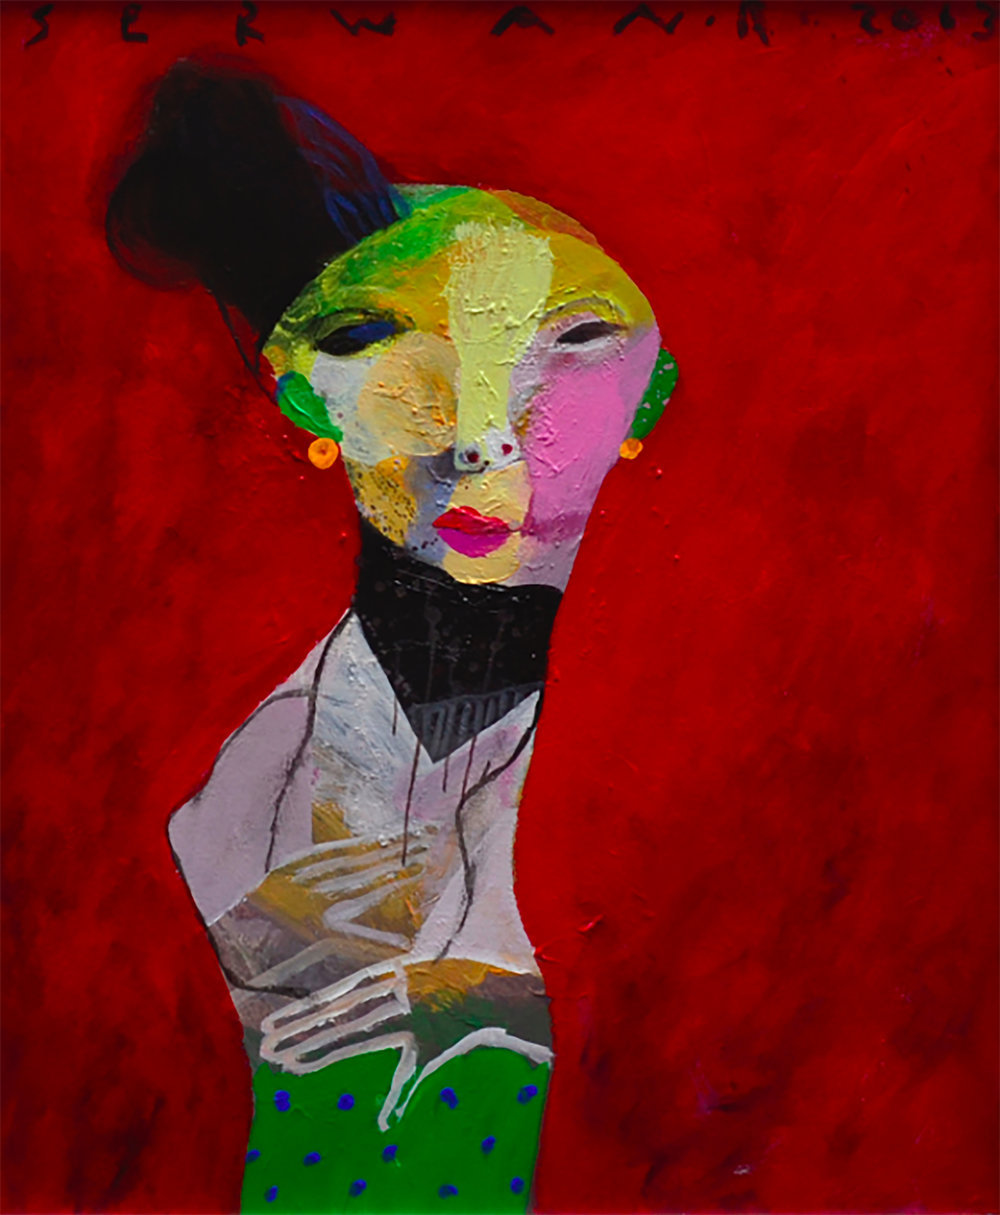 XOL Gallery - Serwan Baran (Iraq) - _Portrait From Iraq I_ - 20 x 24 in - Acrylic on canvas - Amman, 2014 - $6,500.jpg